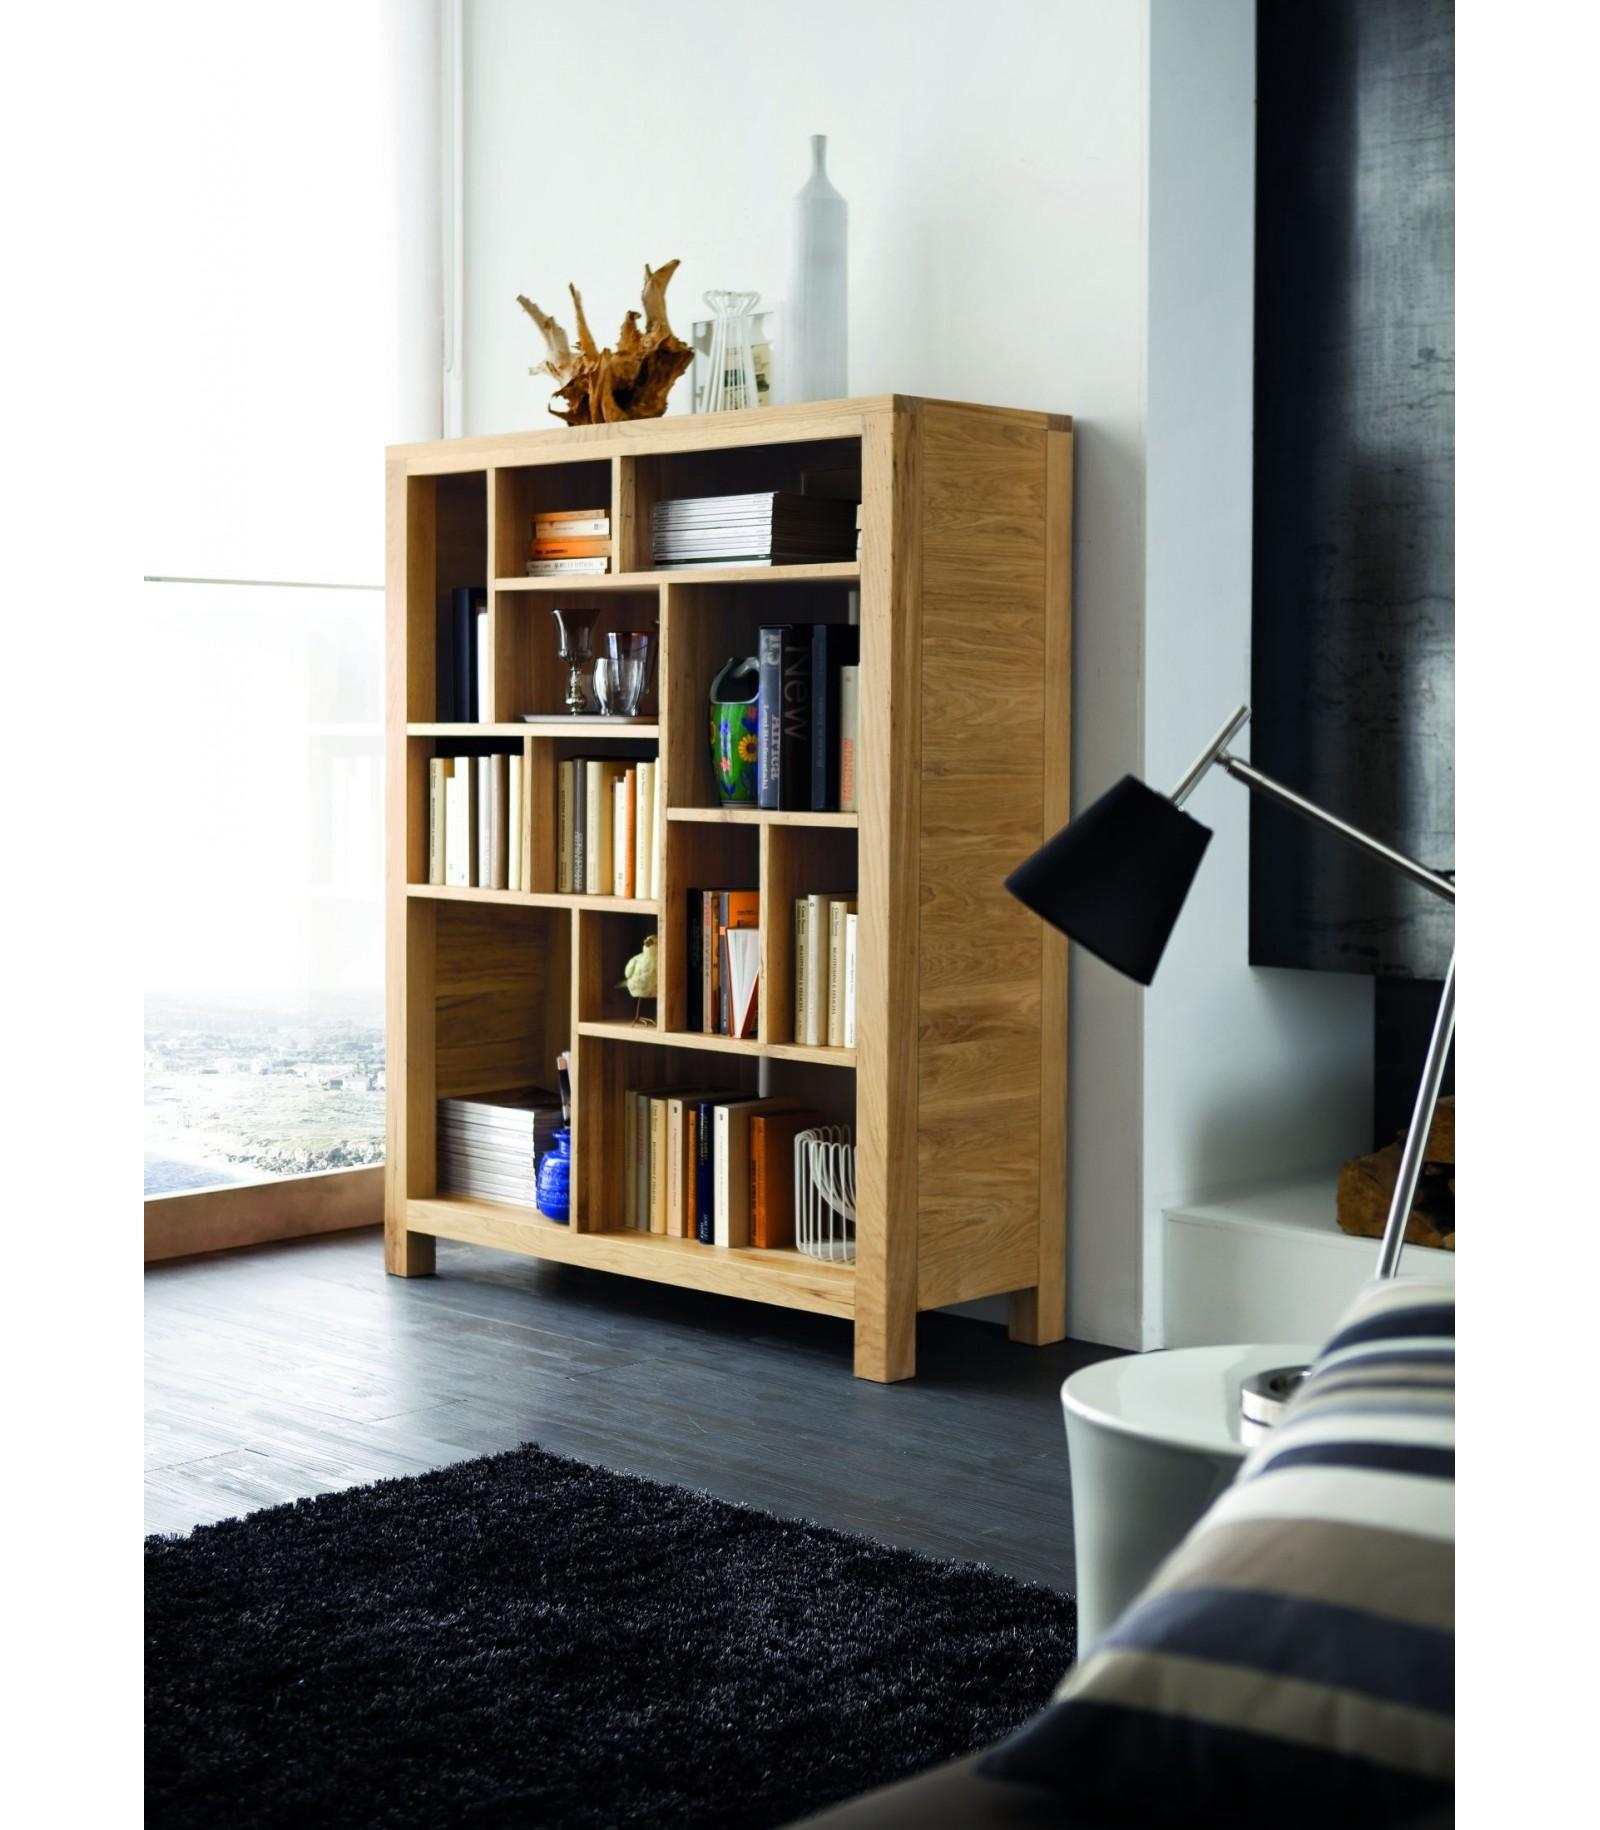 Libreria bifacciale altacorte for Libreria shop online